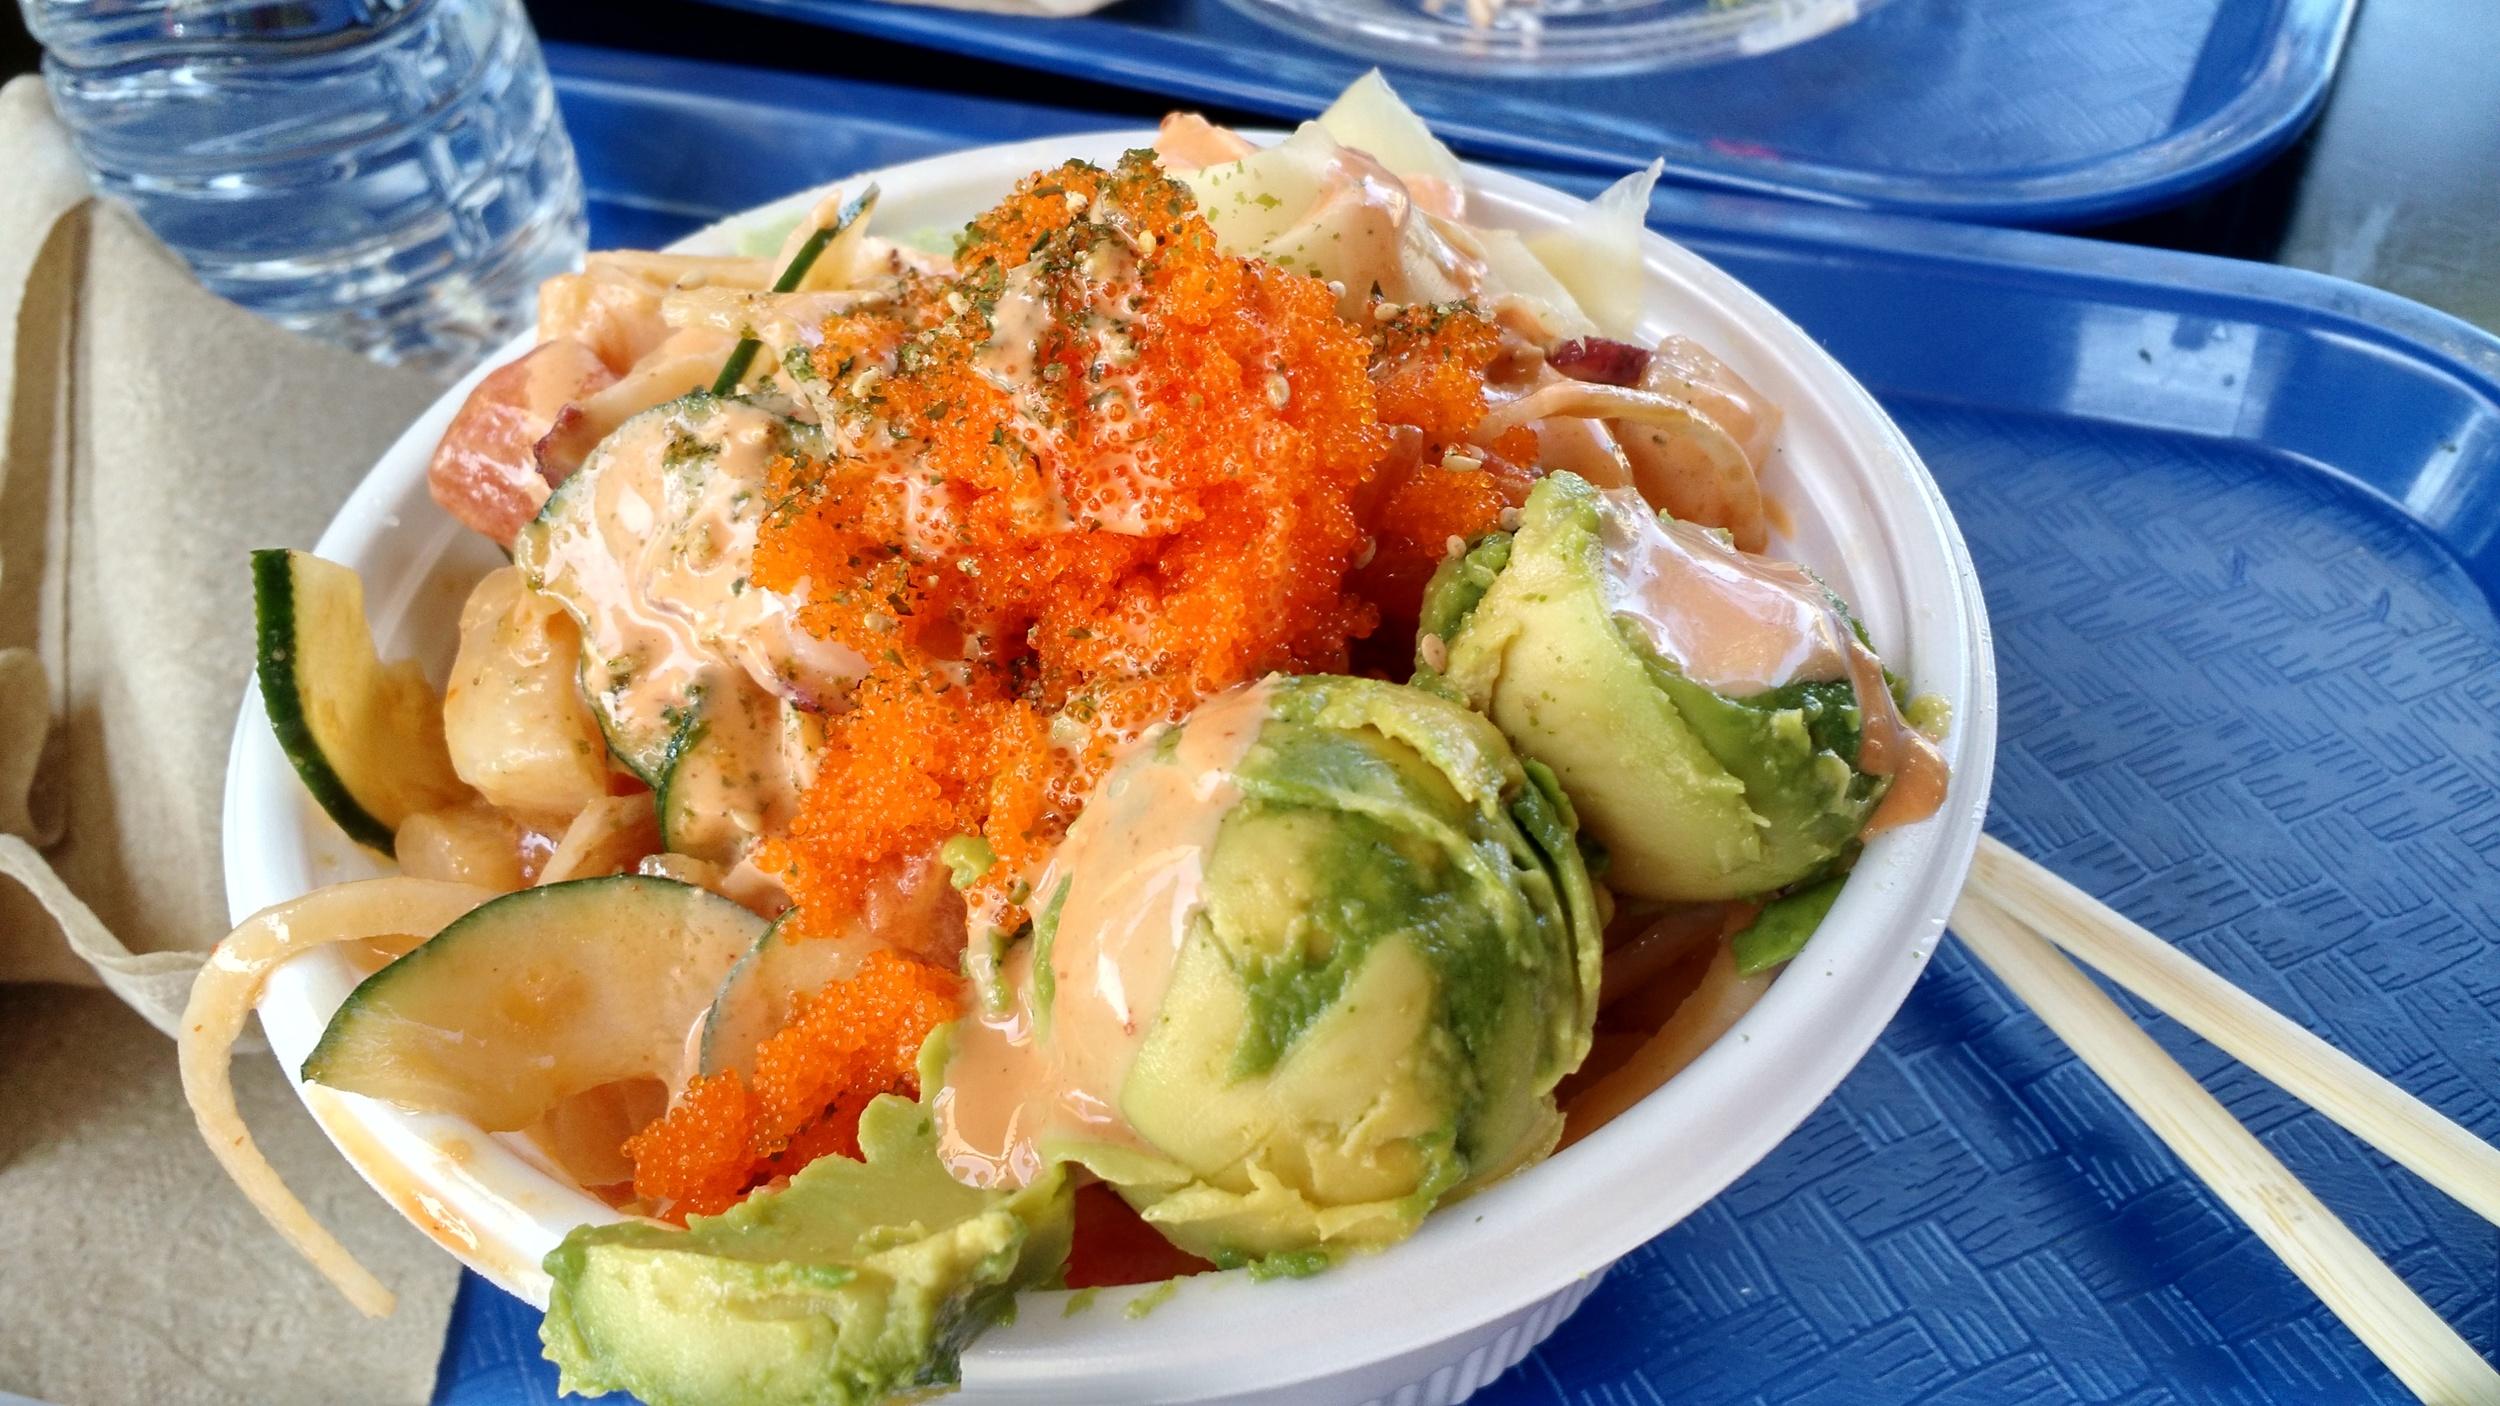 4 Blocks @ Poki Bowl on Almaden Expressway: 6 oz fish, 4 tbsp avocado, 3/4 cup rice+ cucumber +sauce